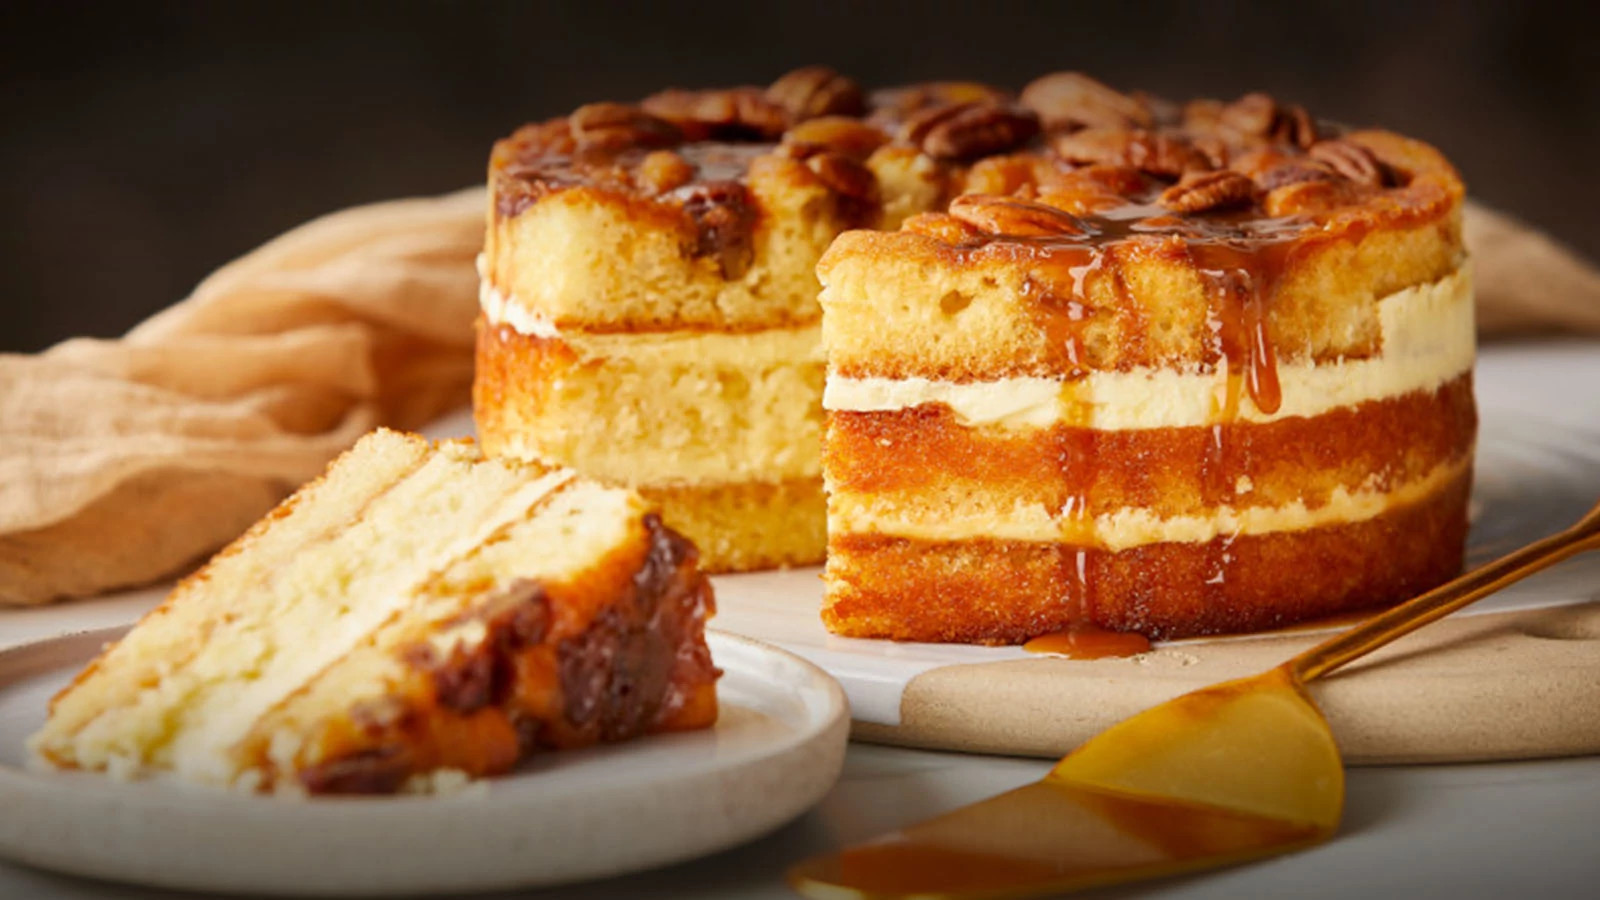 Brown Butter Praline Cake